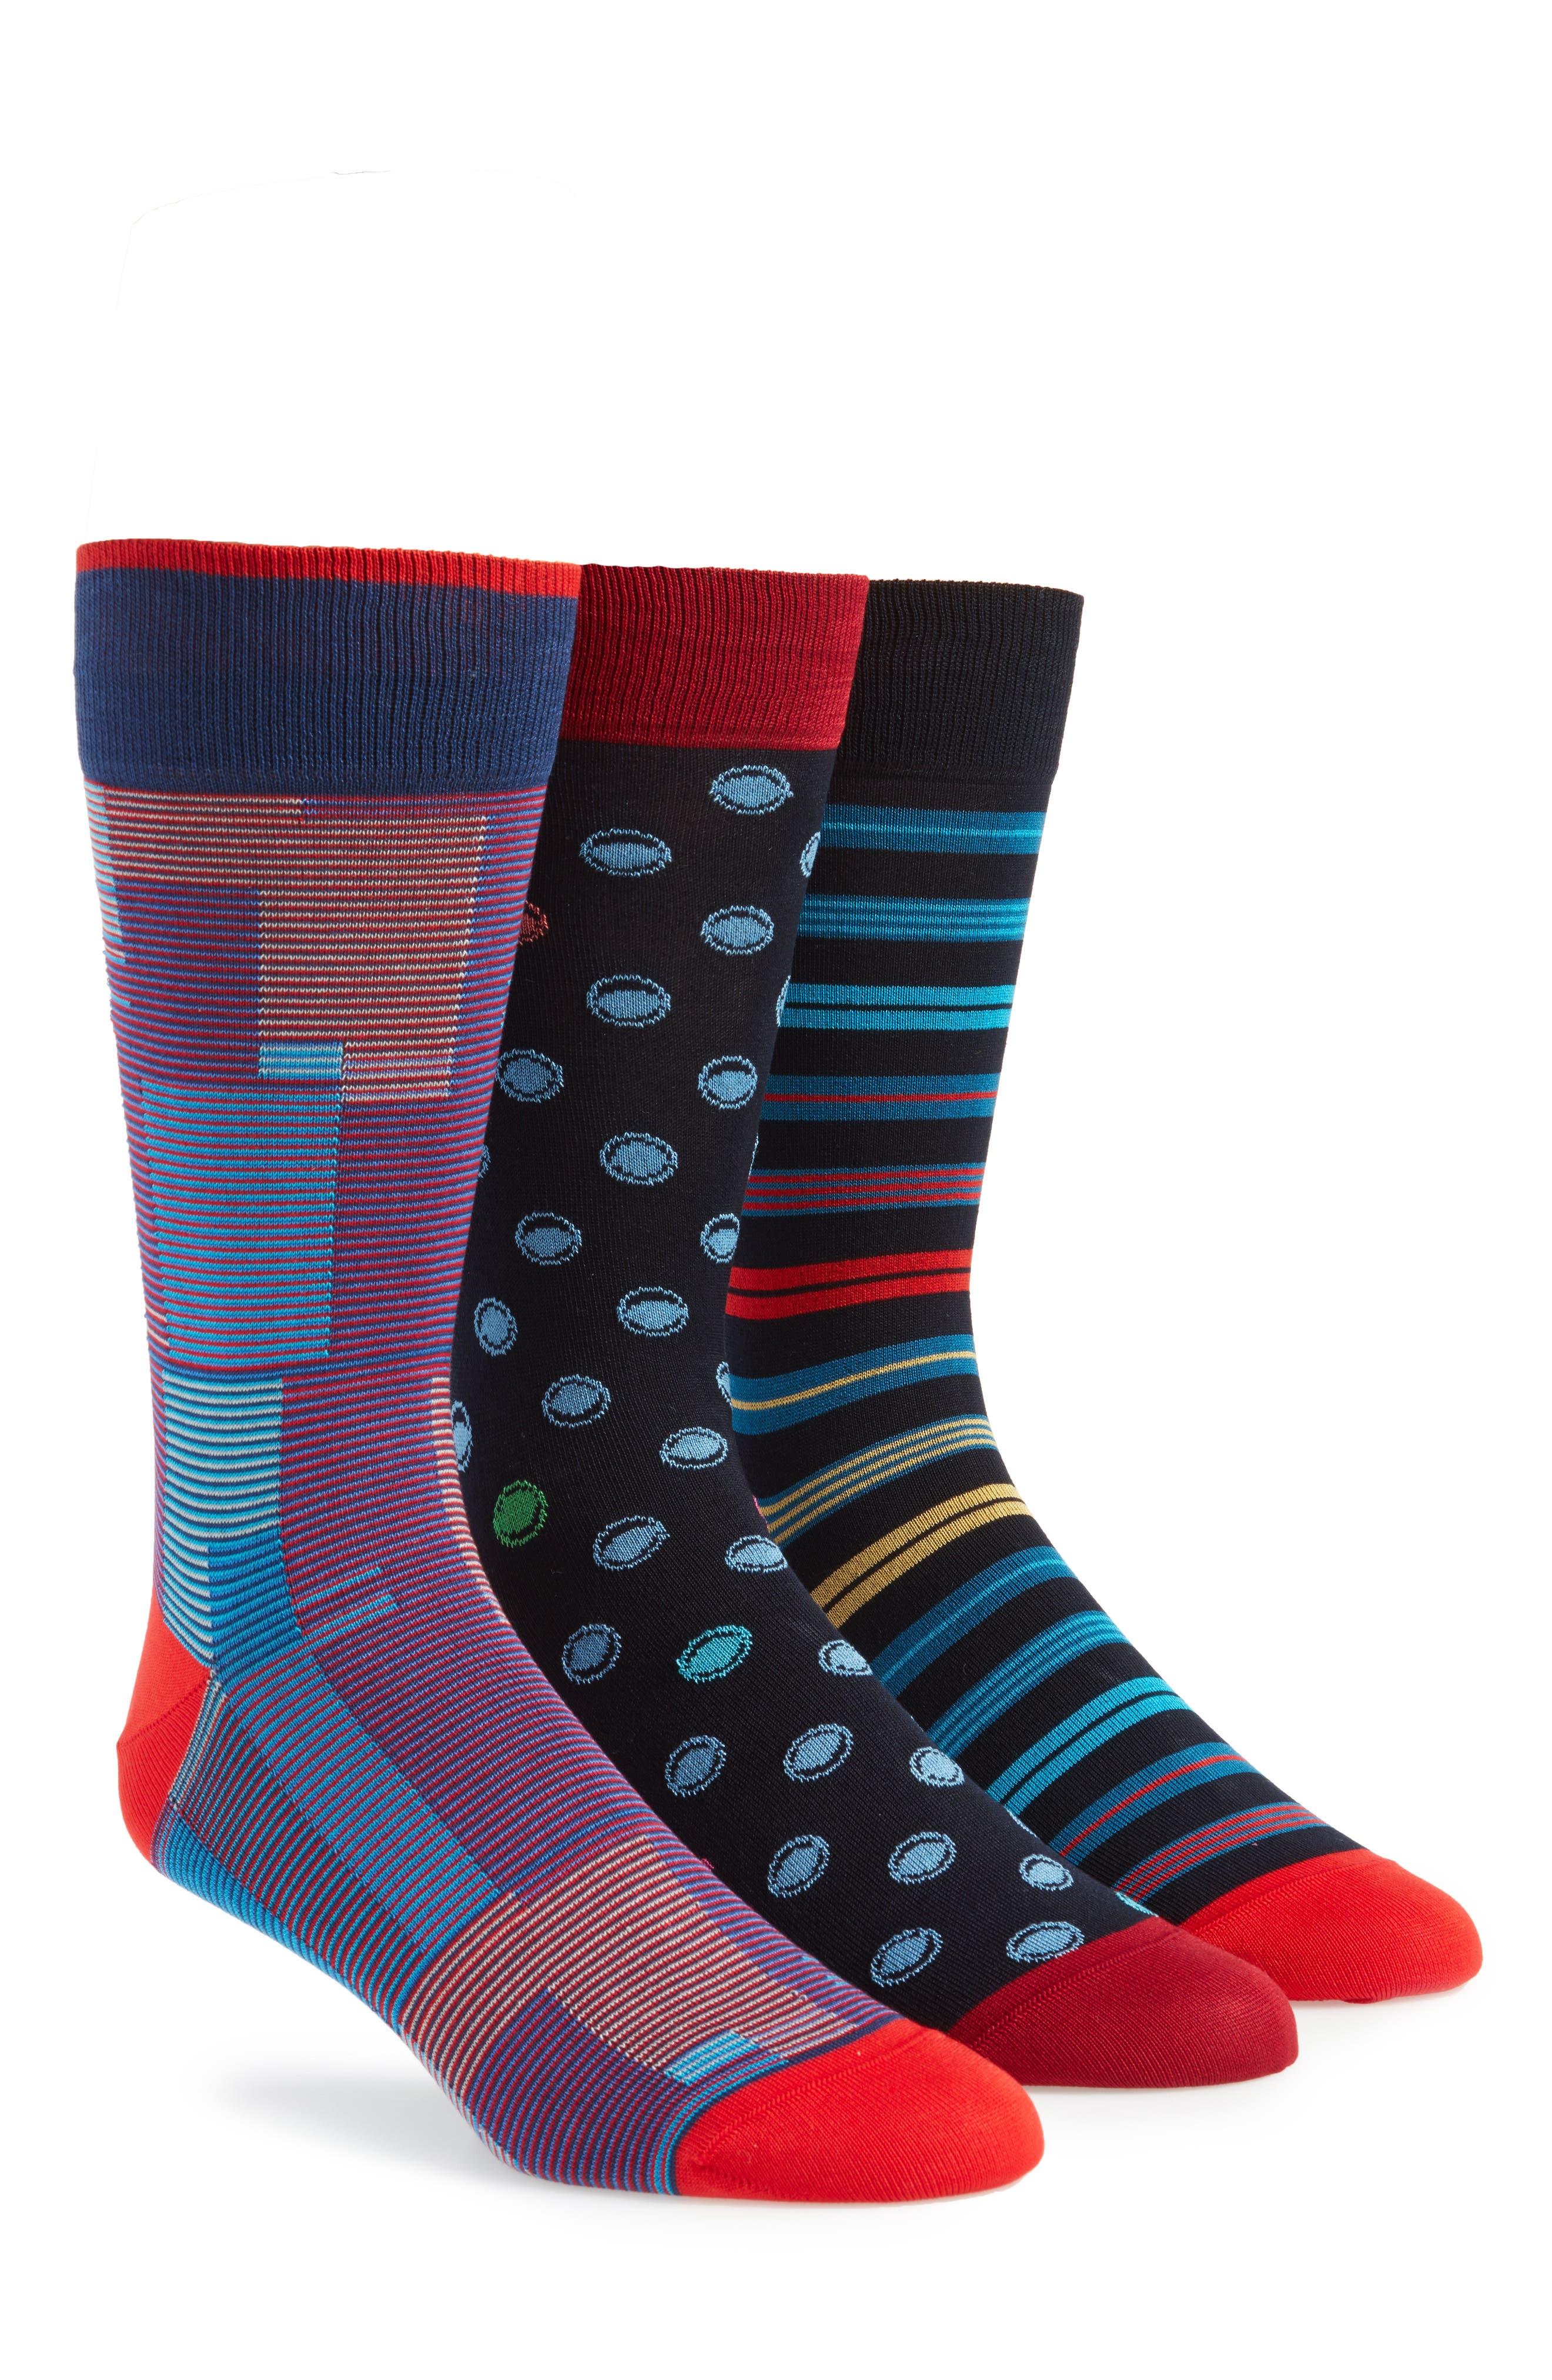 3-Pack Assorted Mercerized Cotton Blend Sock Gift Set,                         Main,                         color, 410